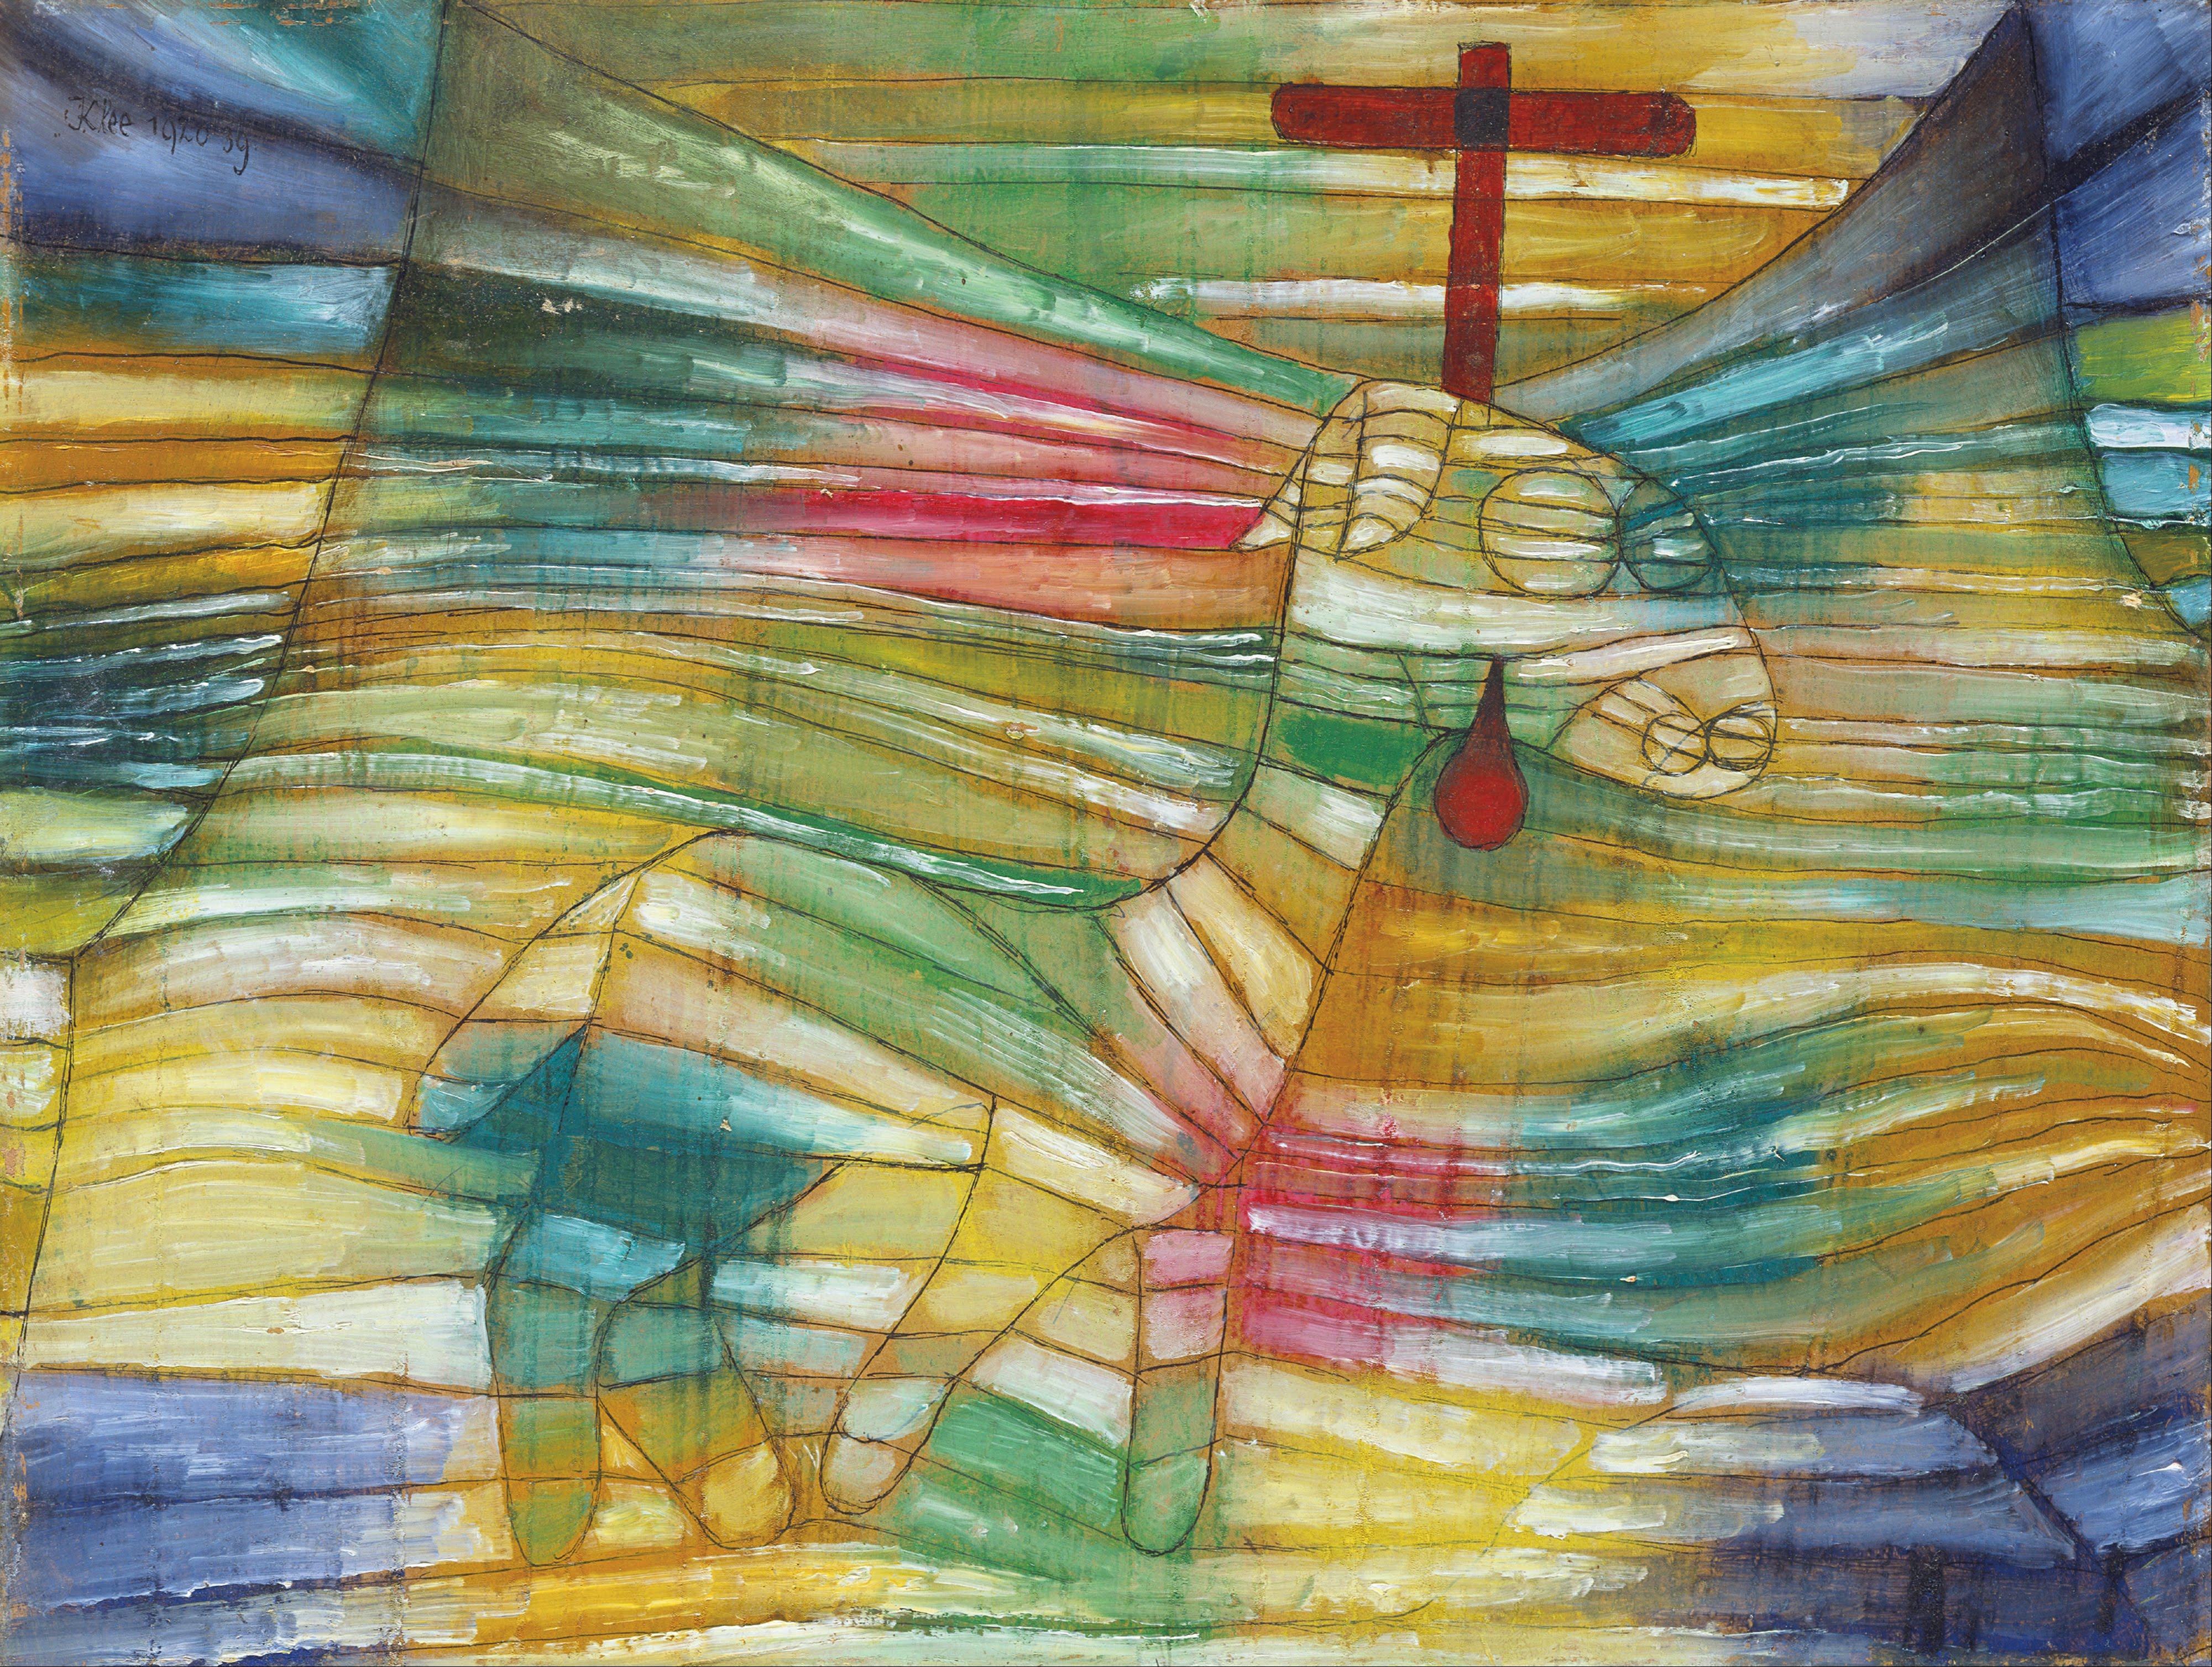 Paul Klee Google Art Project